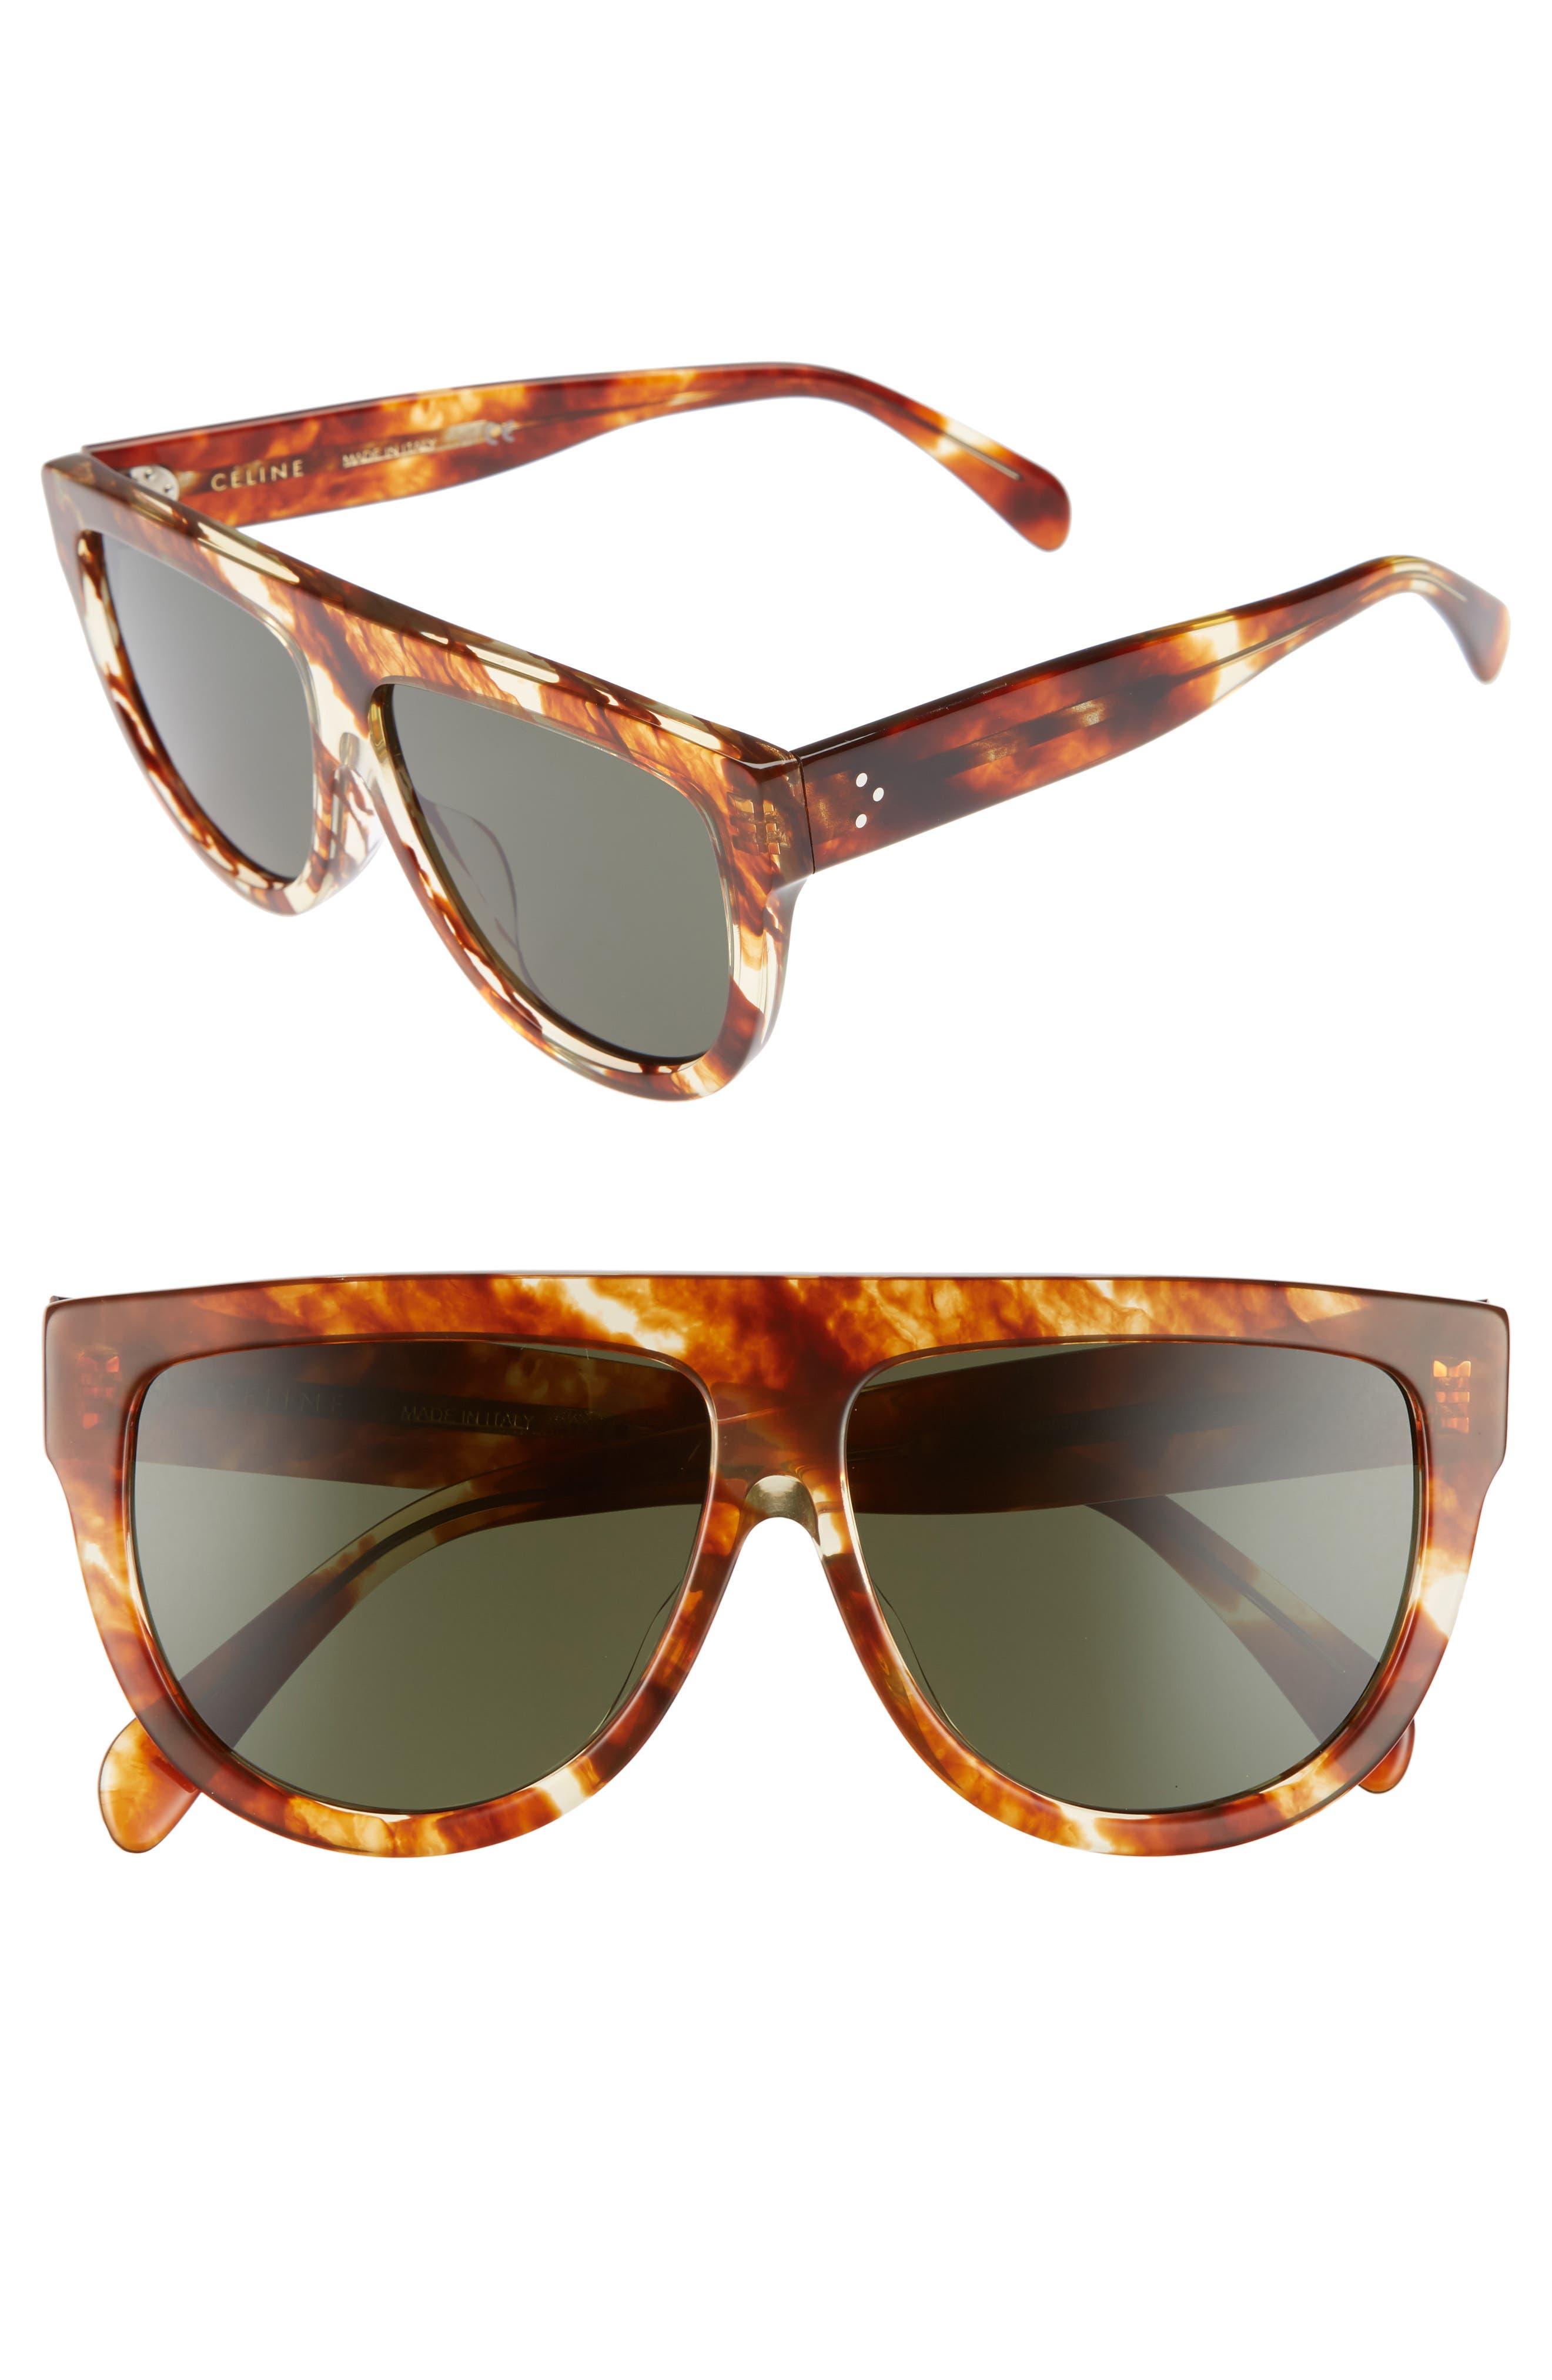 Special Fit 60mm Flat Top Sunglasses,                         Main,                         color, Striped Cognac Havana/ Green